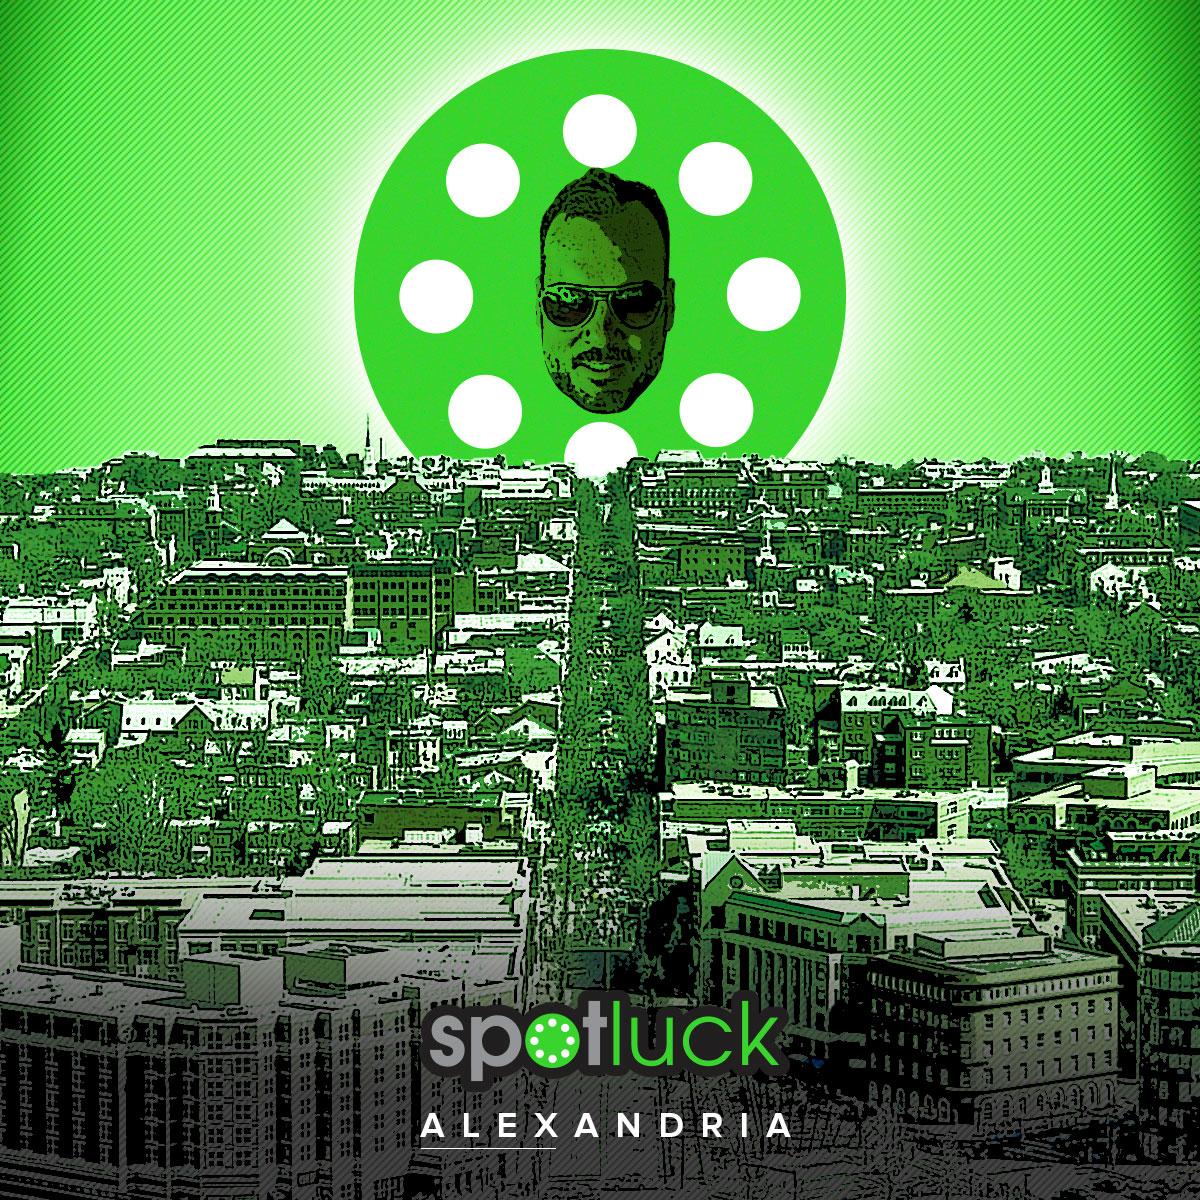 alexandria-hub-launch-spotluck